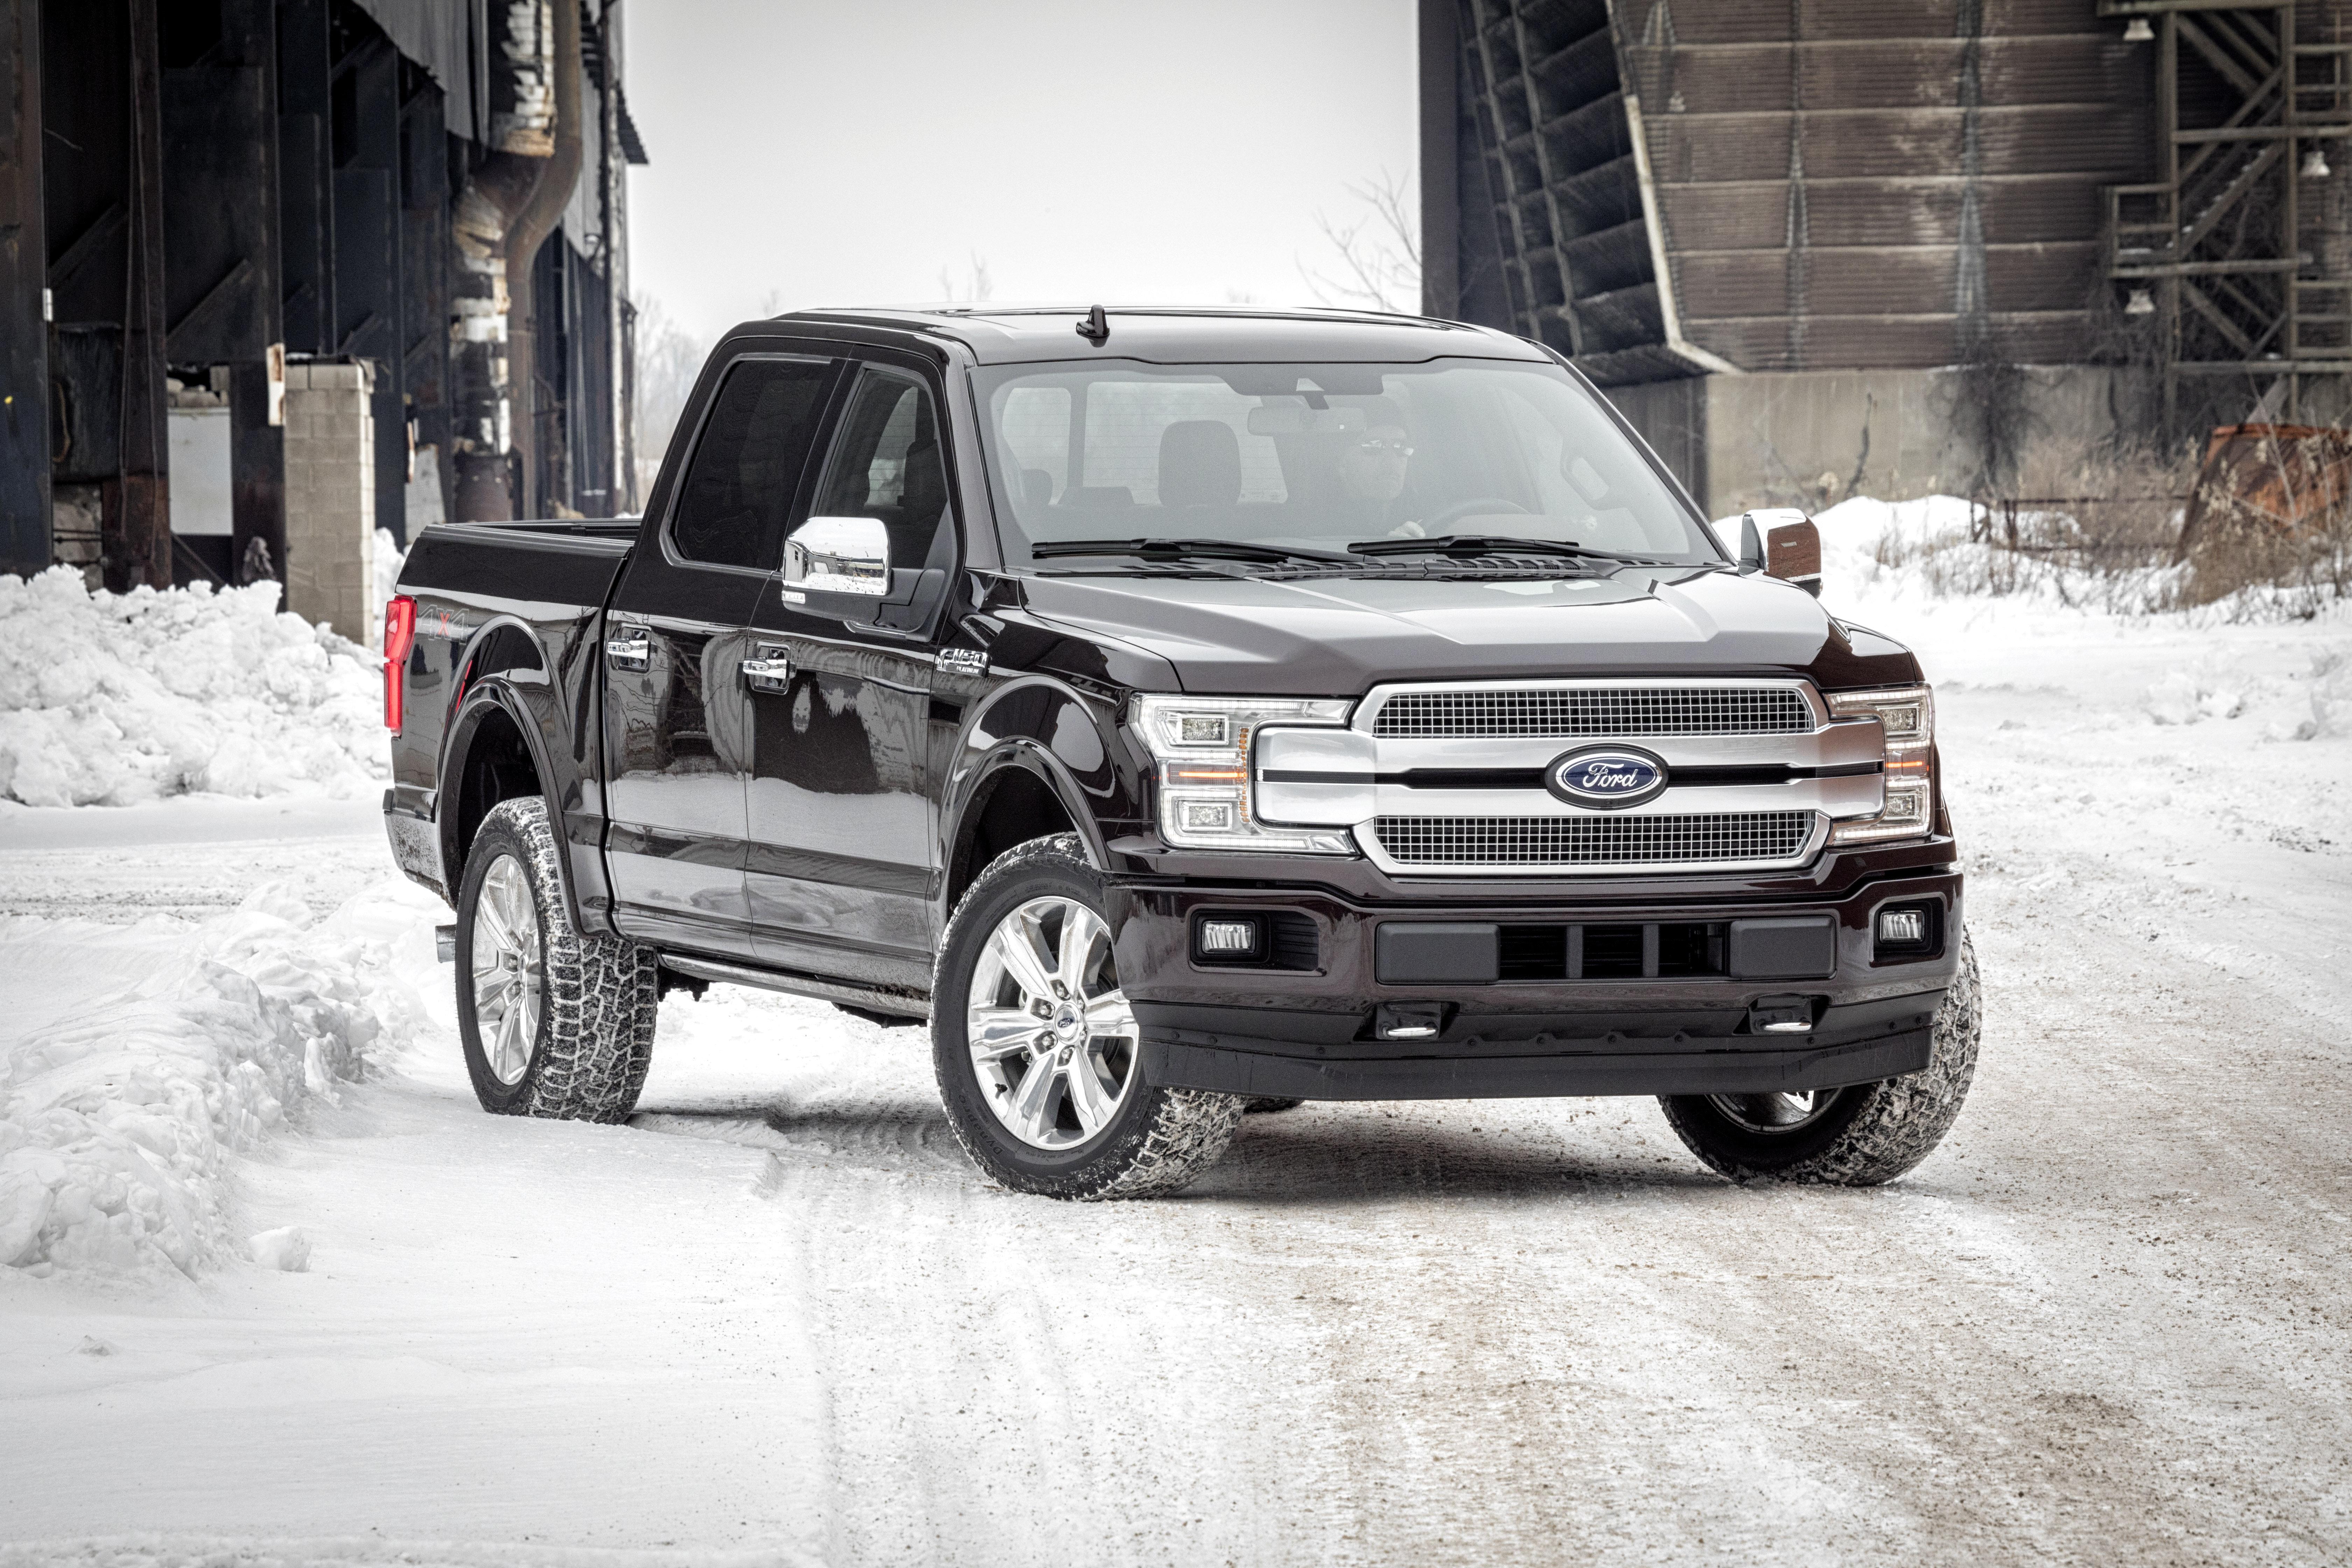 A black 2018 Ford F-150 pickup truck on a snowy street.